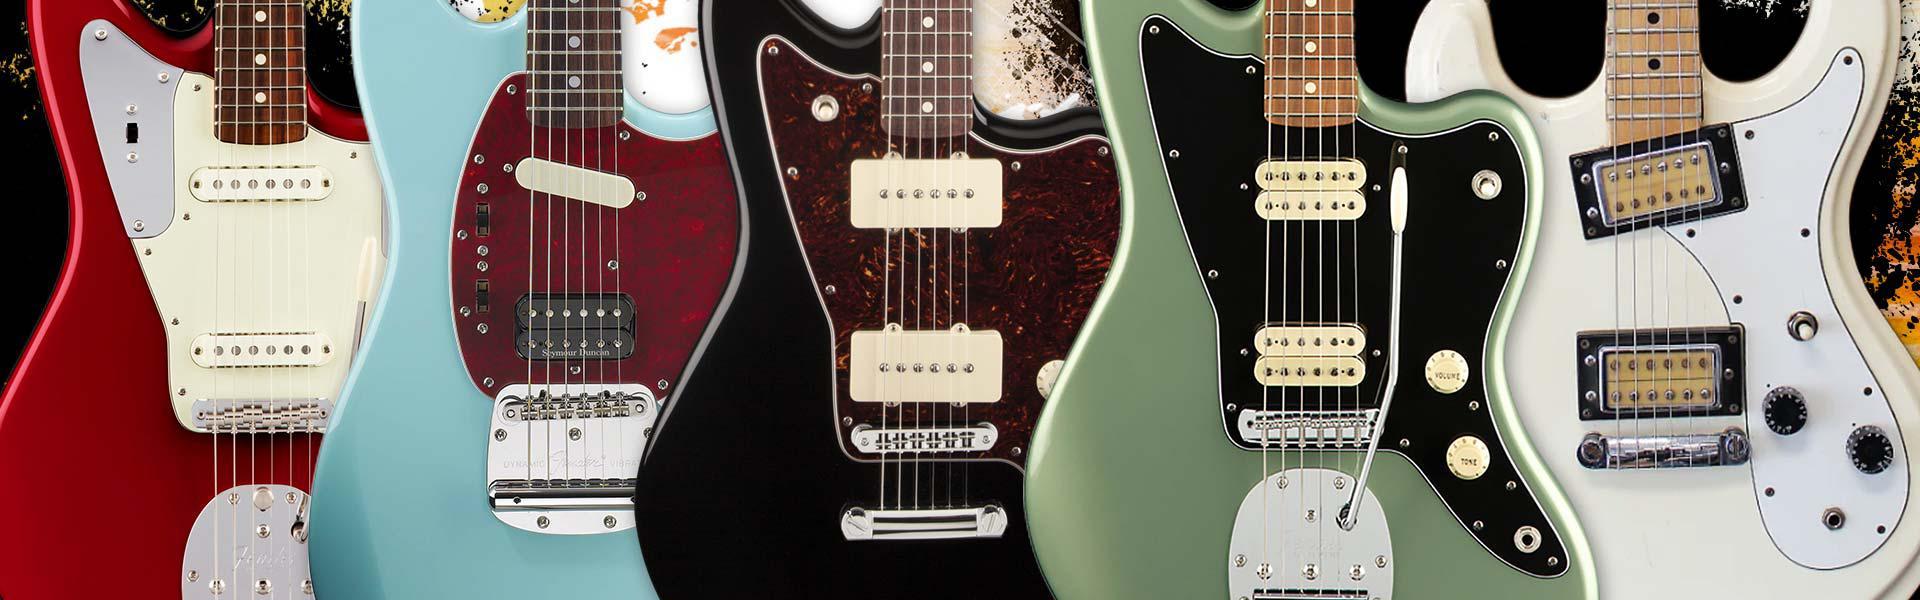 Stephen Arnold Music to Raffle Grunge-Themed Guitars